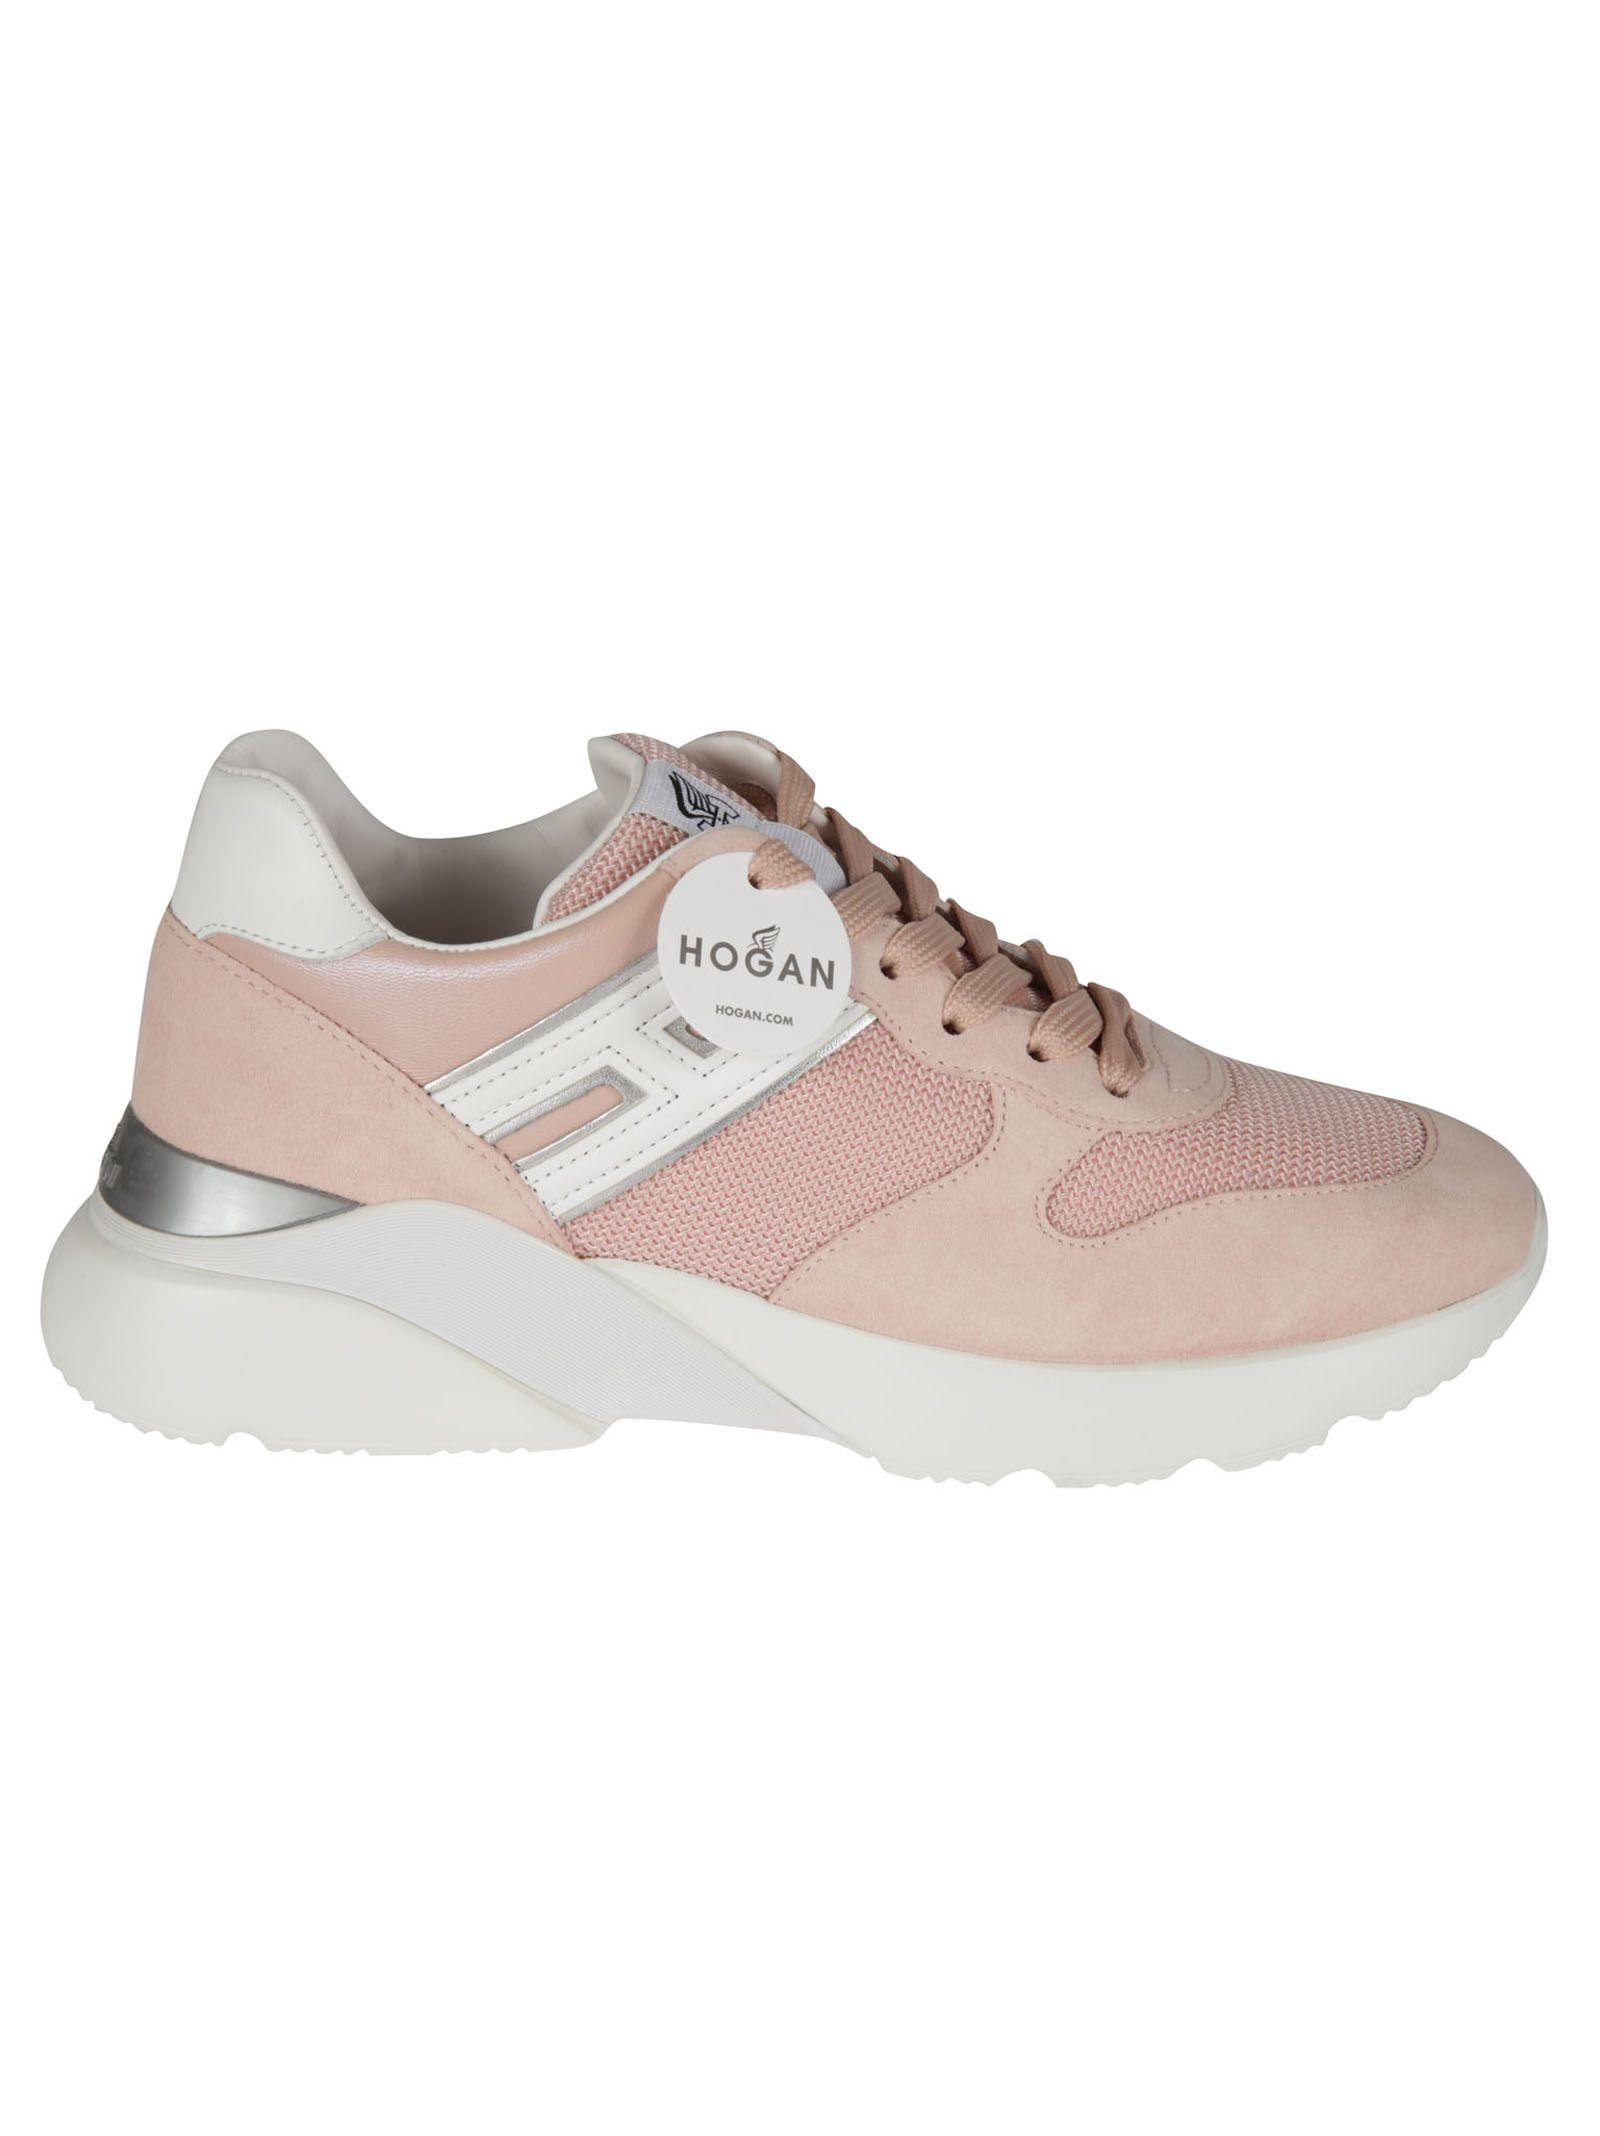 9067ac0f6d Hogan Hogan Interactive Paneled Sneakers - Pink - 10863986   italist